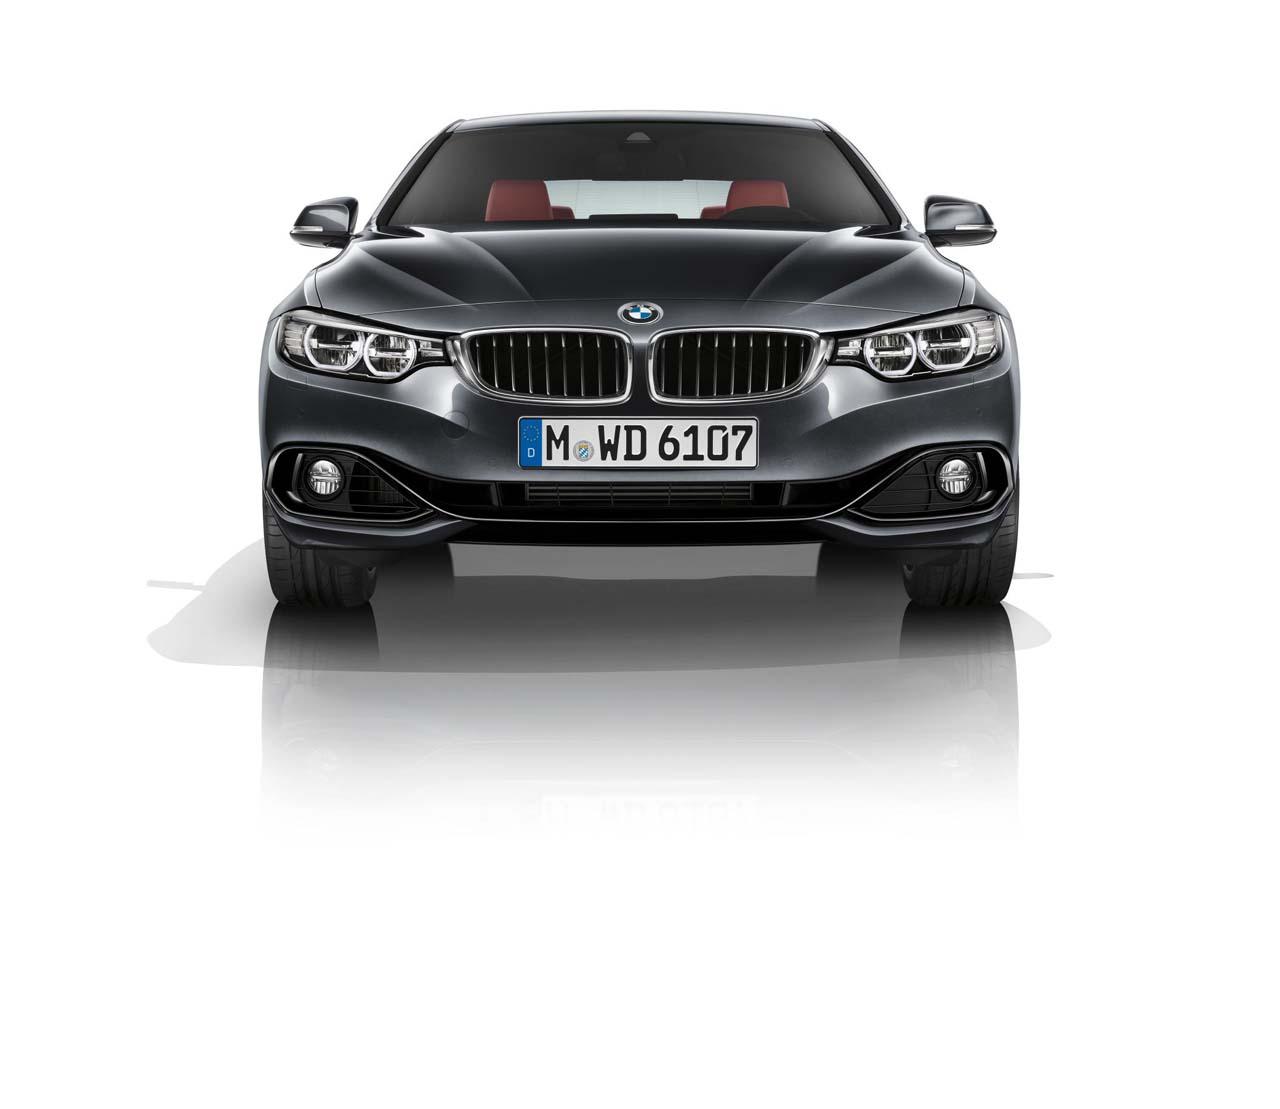 http://www.diseno-art.com/news_content/wp-content/uploads/2013/06/BMW-4-Series-32.jpg